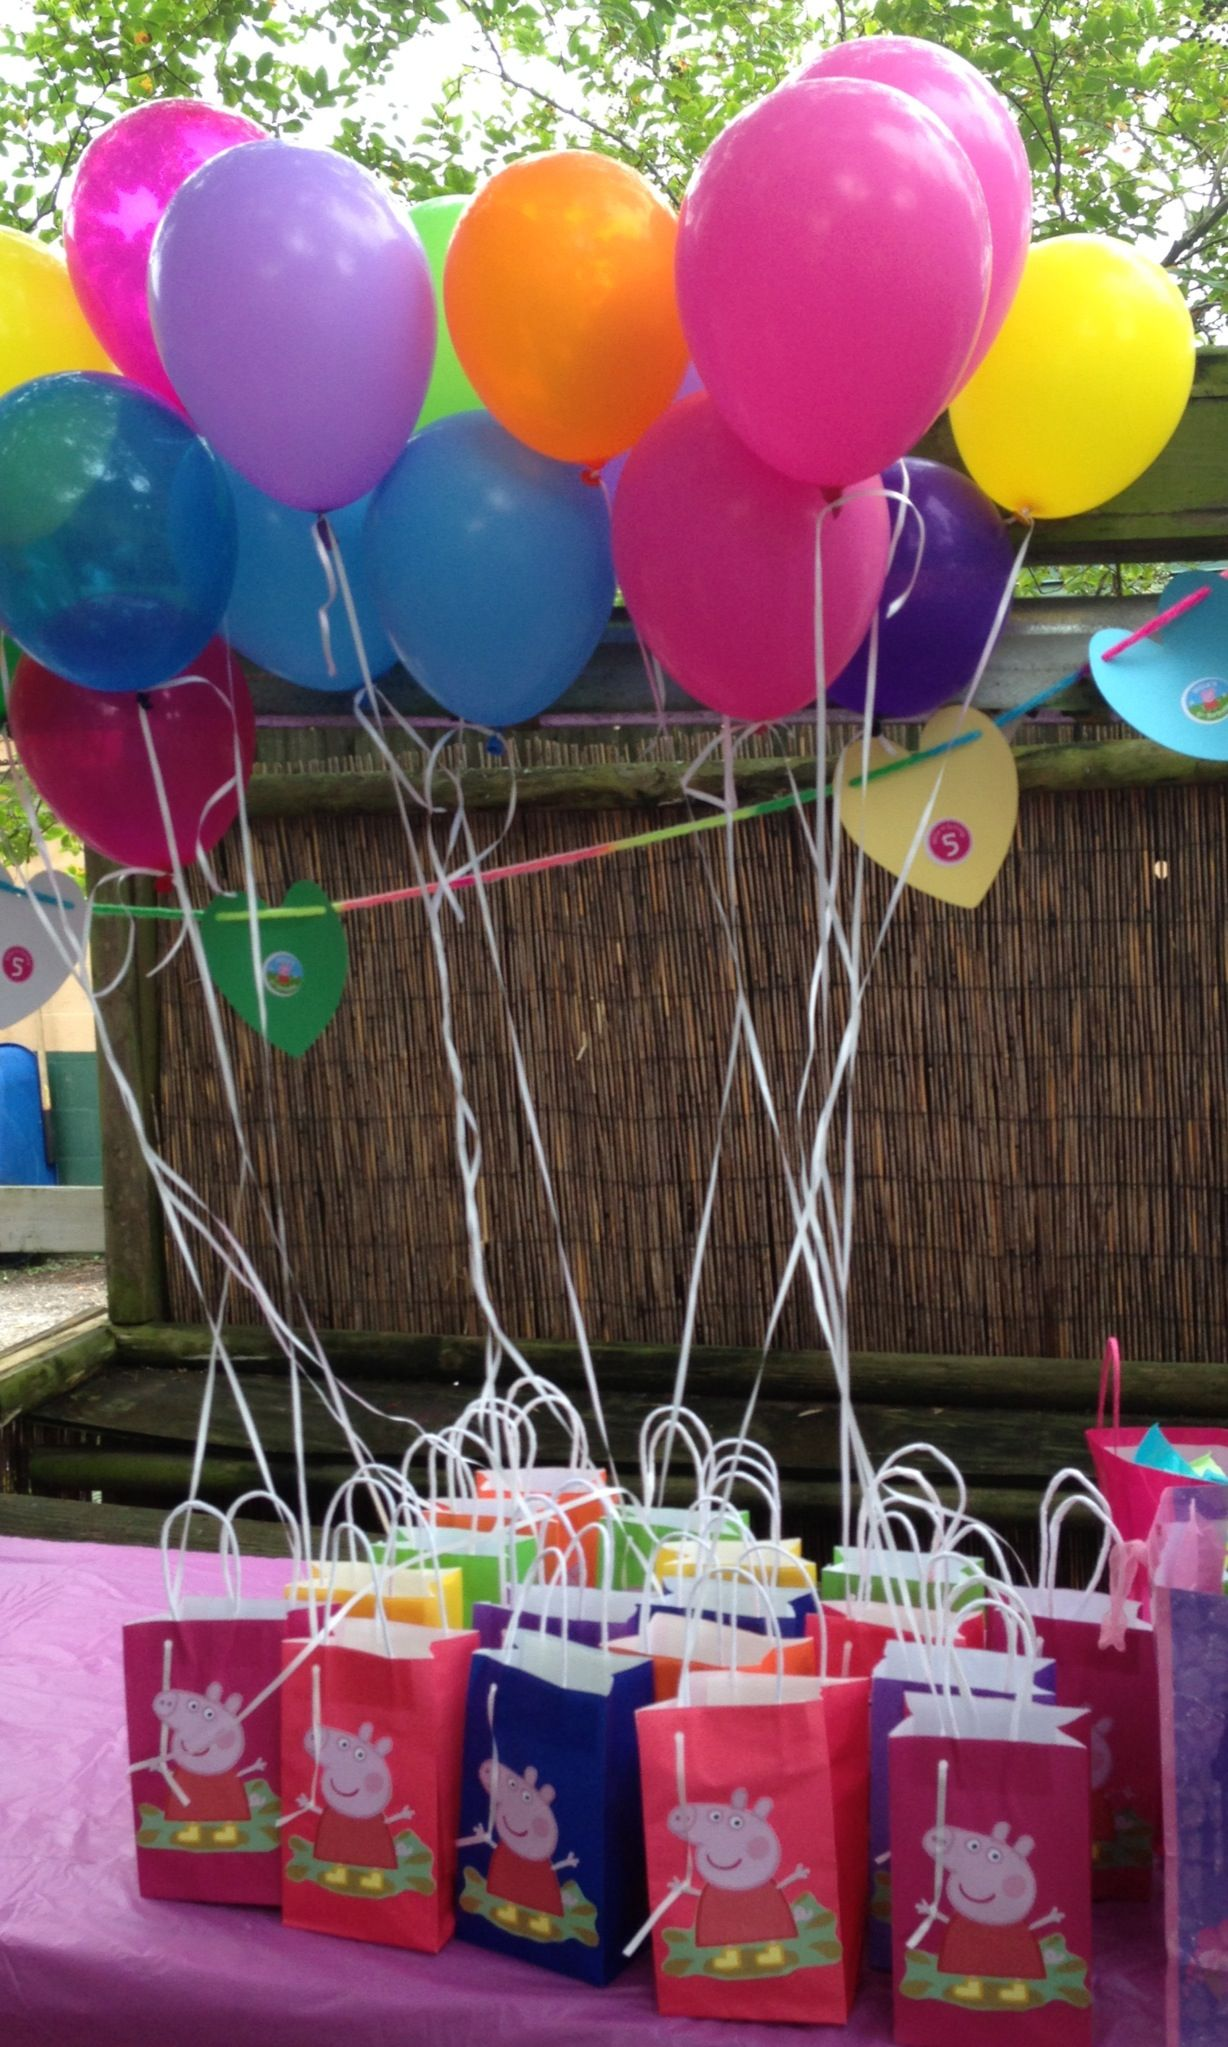 d493d357a Peppa pig bolsita de souvenir. | ambientación para fiestas | Fiesta ...